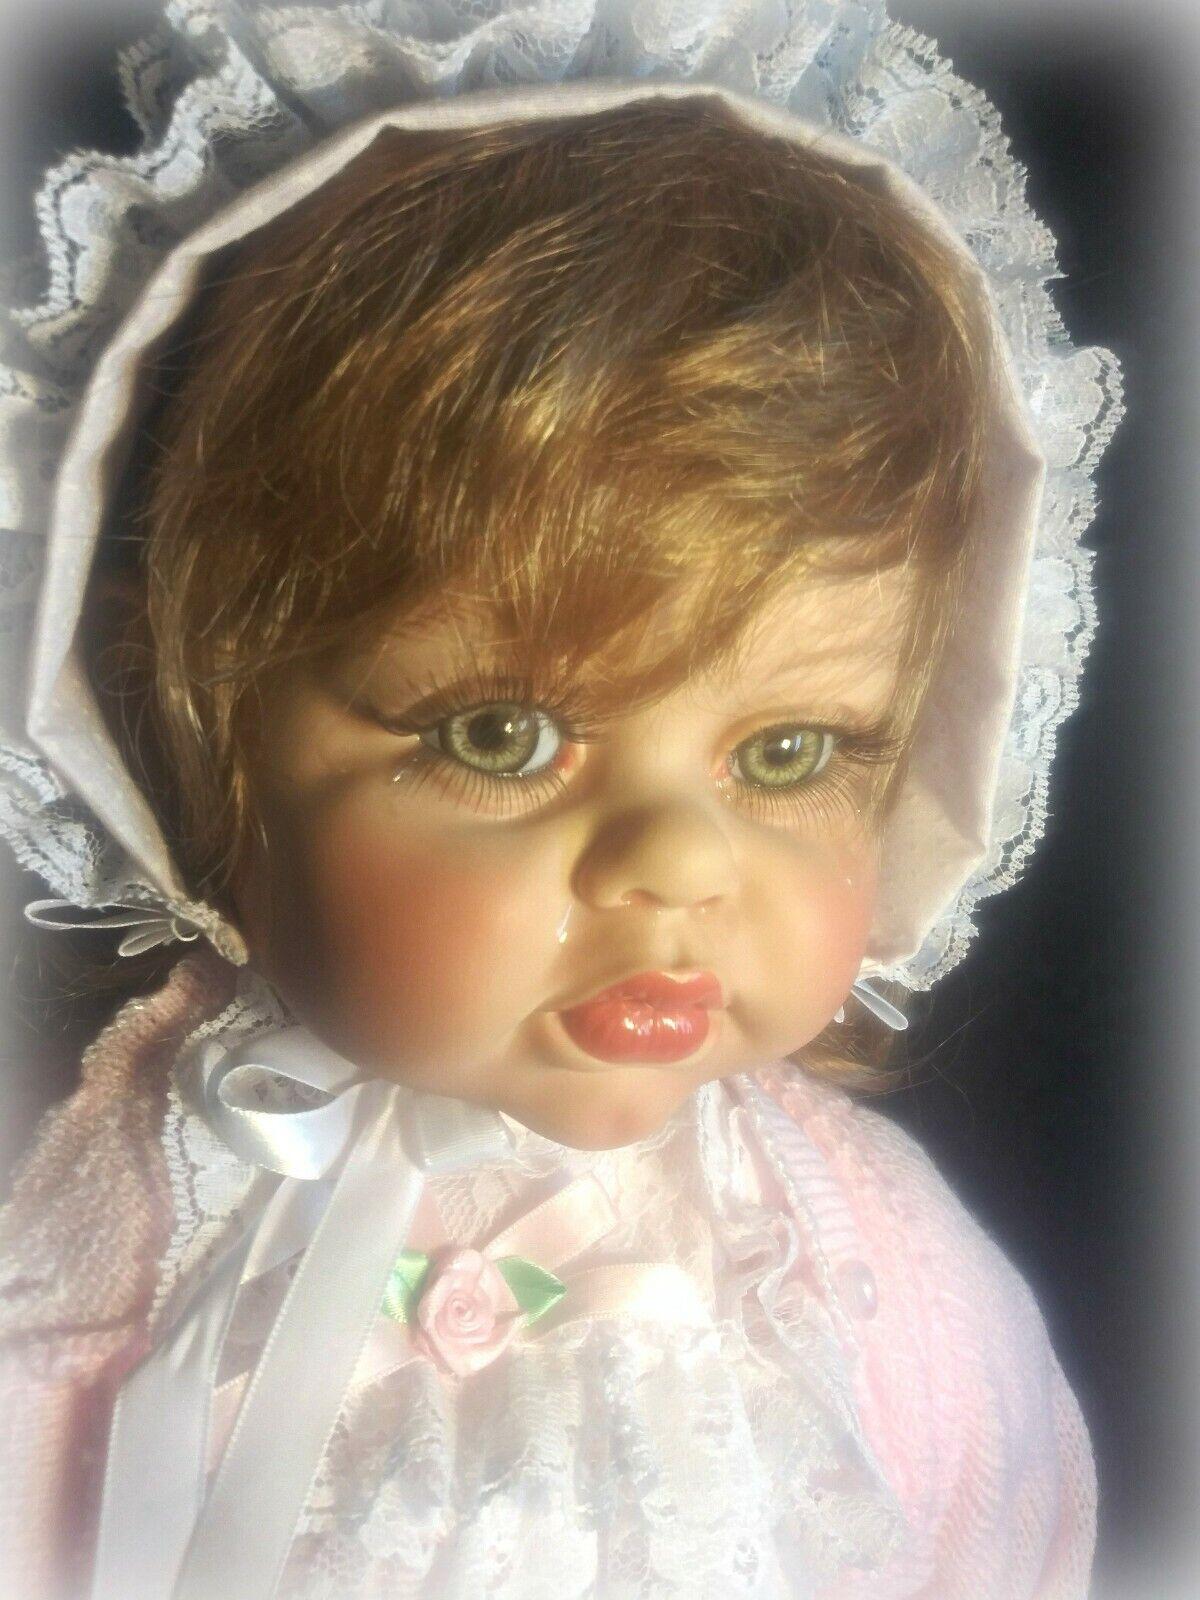 FAYZAH SPANOS, Misty Boo Hoo Muñeca, 28  hermosos ojos verdes, etiqueta de la mano